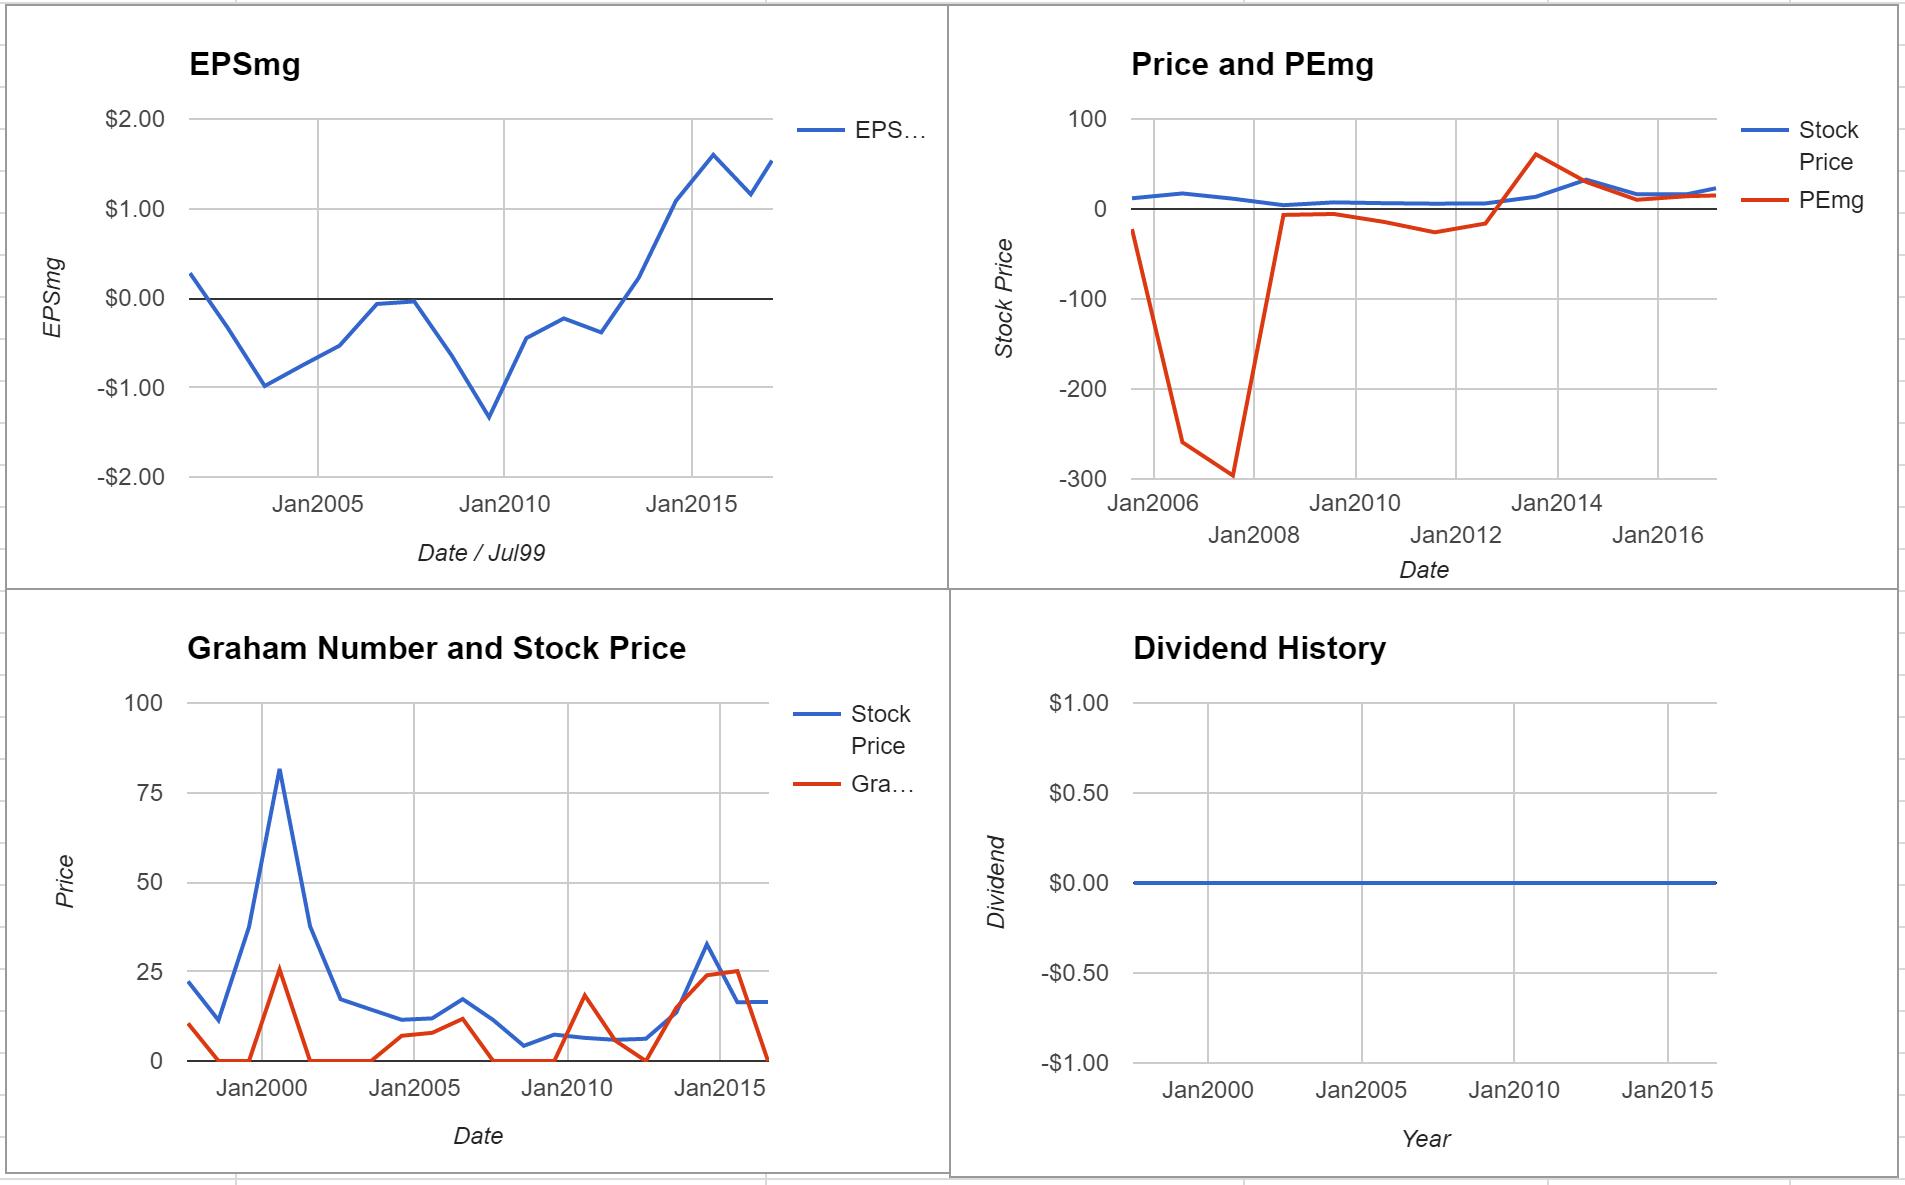 Micron Technology Inc Valuation – February 2017 $MU